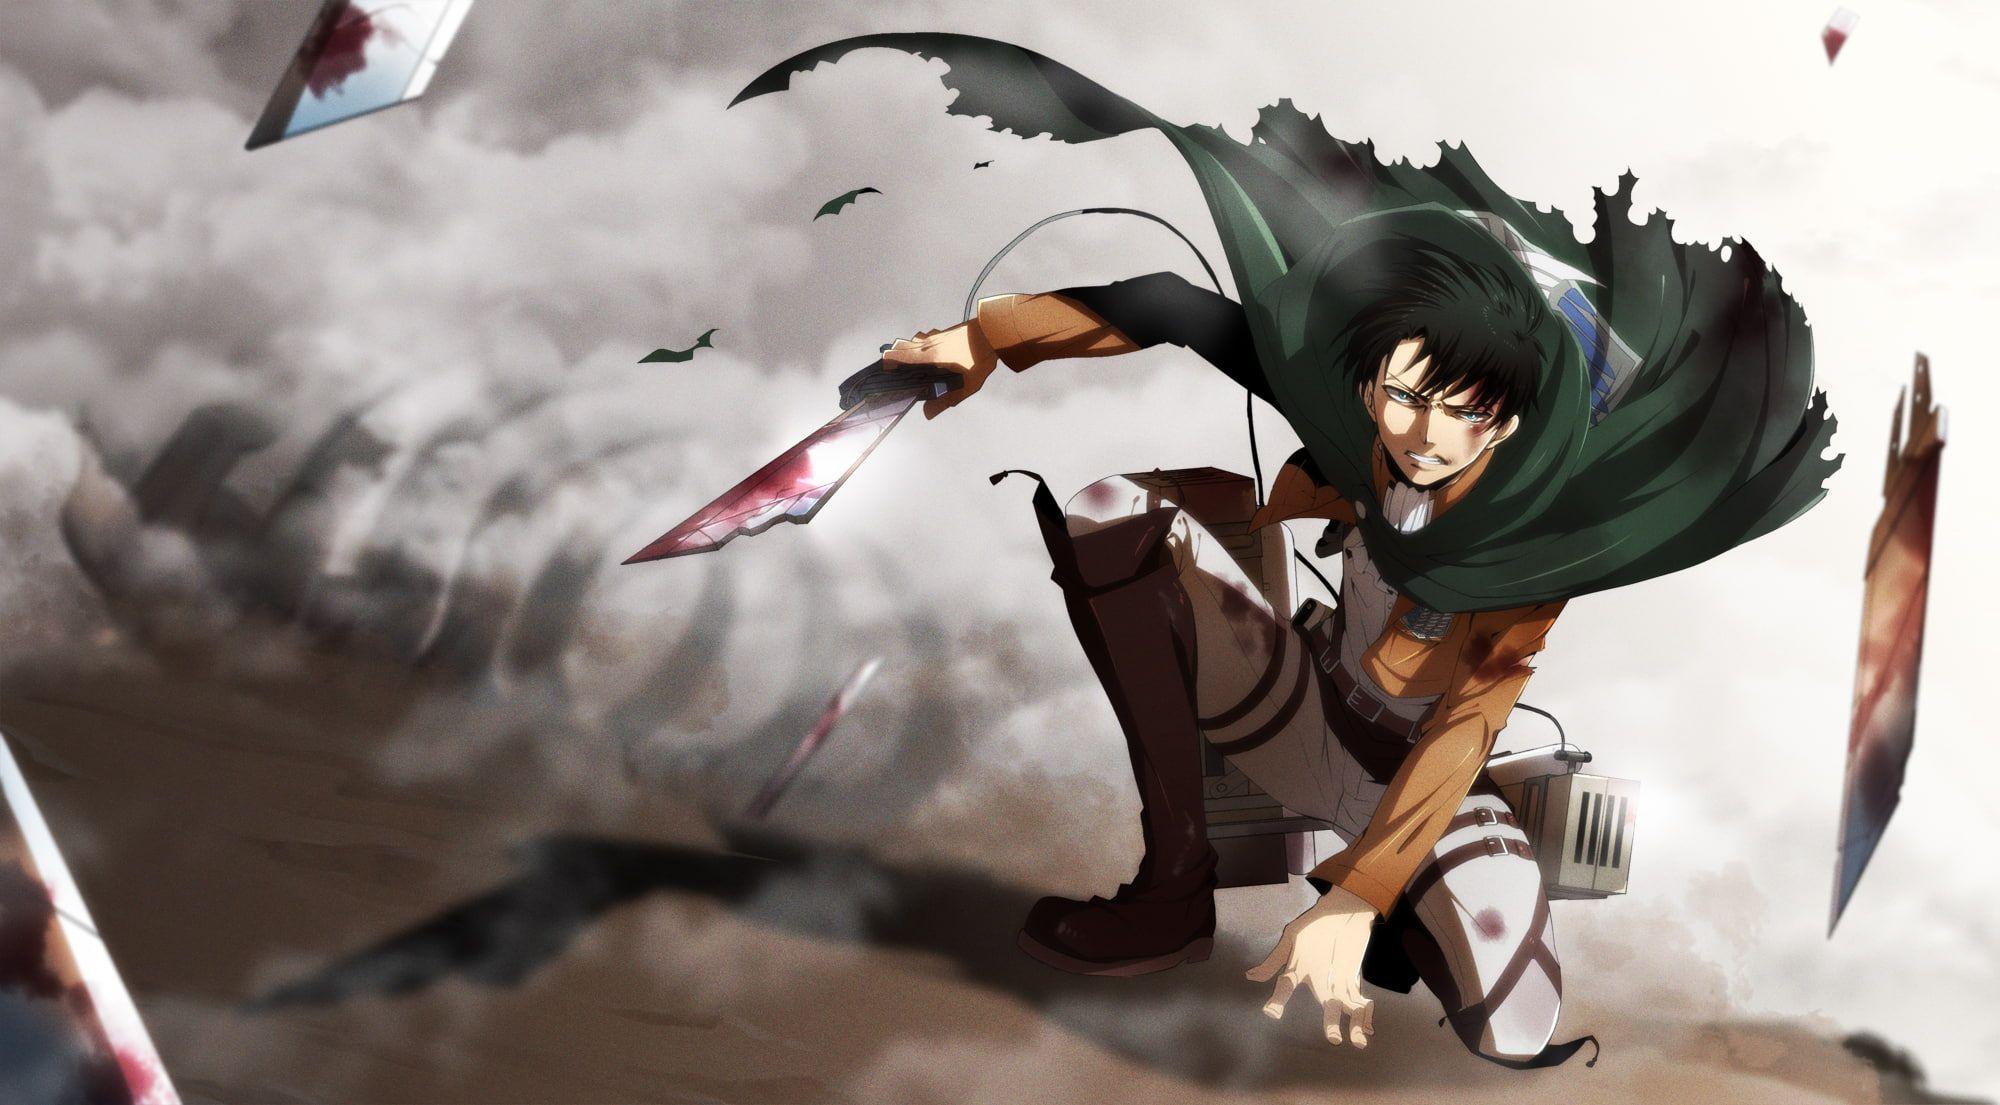 Anime Attack On Titan Attack On Titan Levi Ackerman 1080p Wallpaper Hdwallpaper Desktop Attack On Titan Anime Attack On Titan Art